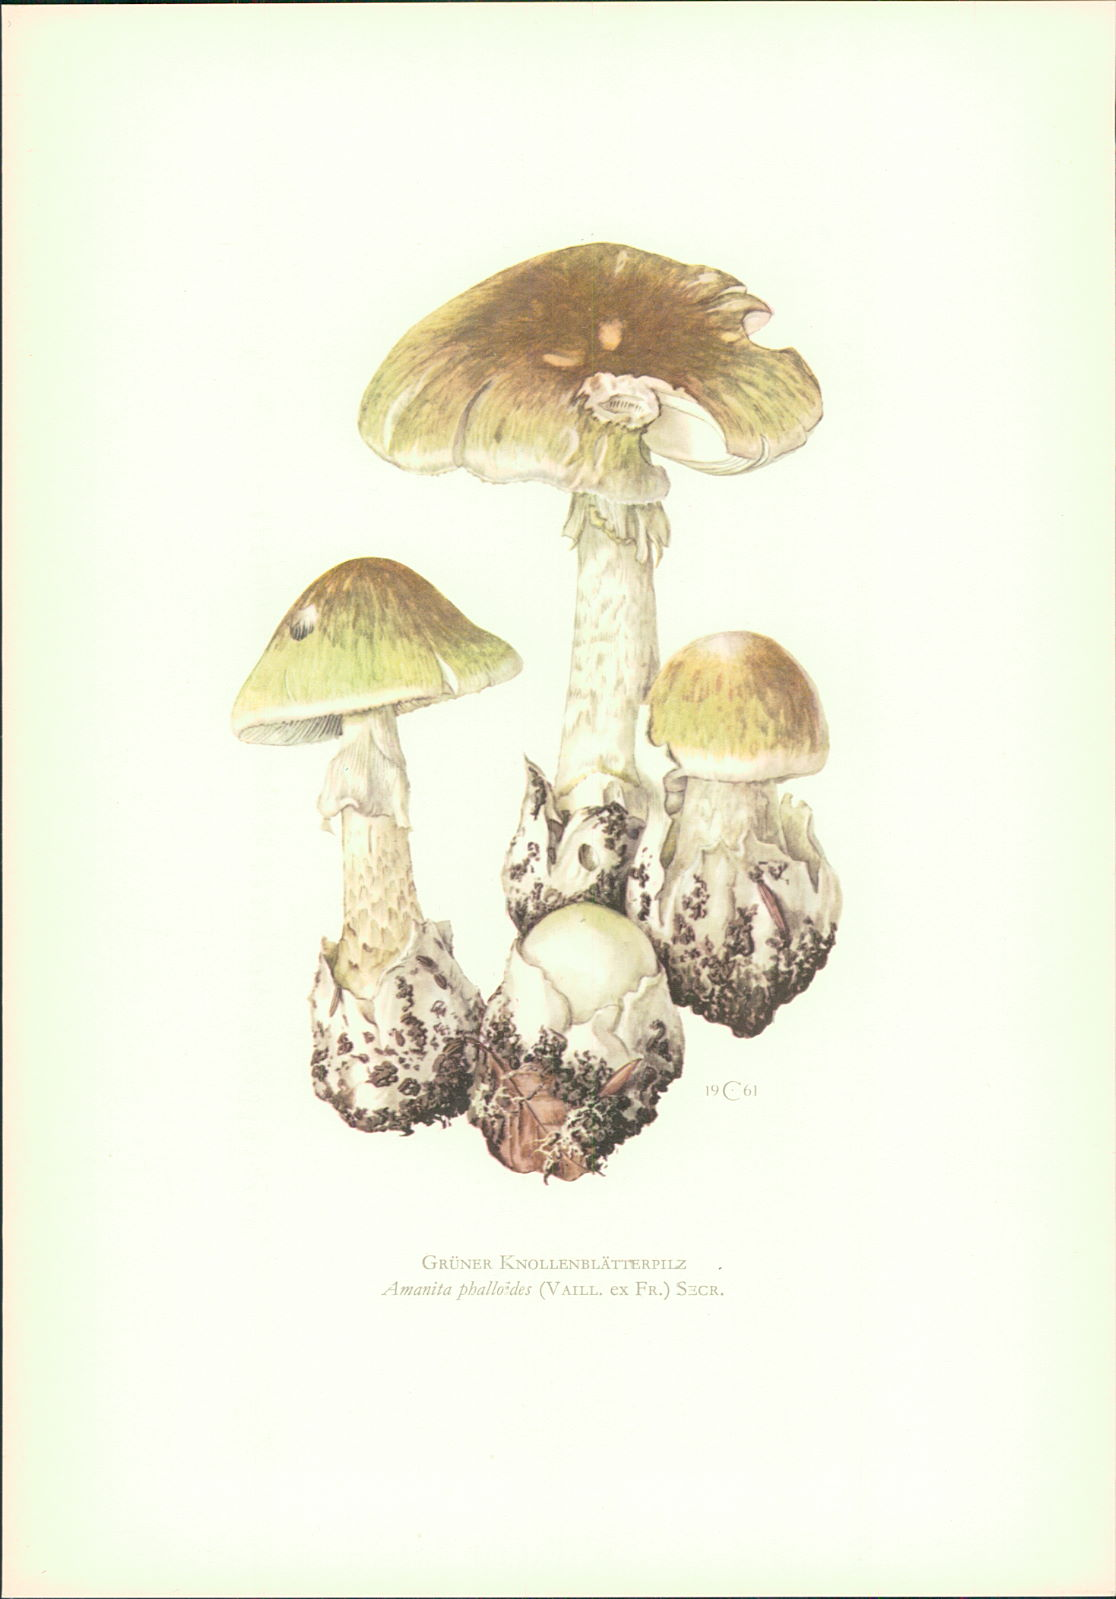 Caspari, C.: Pilze - Claus Caspari : Grüner Knollenblätterpilz. Amanita phalloides (Vaill. ex Fr.) Secr. Offset-Lithographie von C. Caspari.